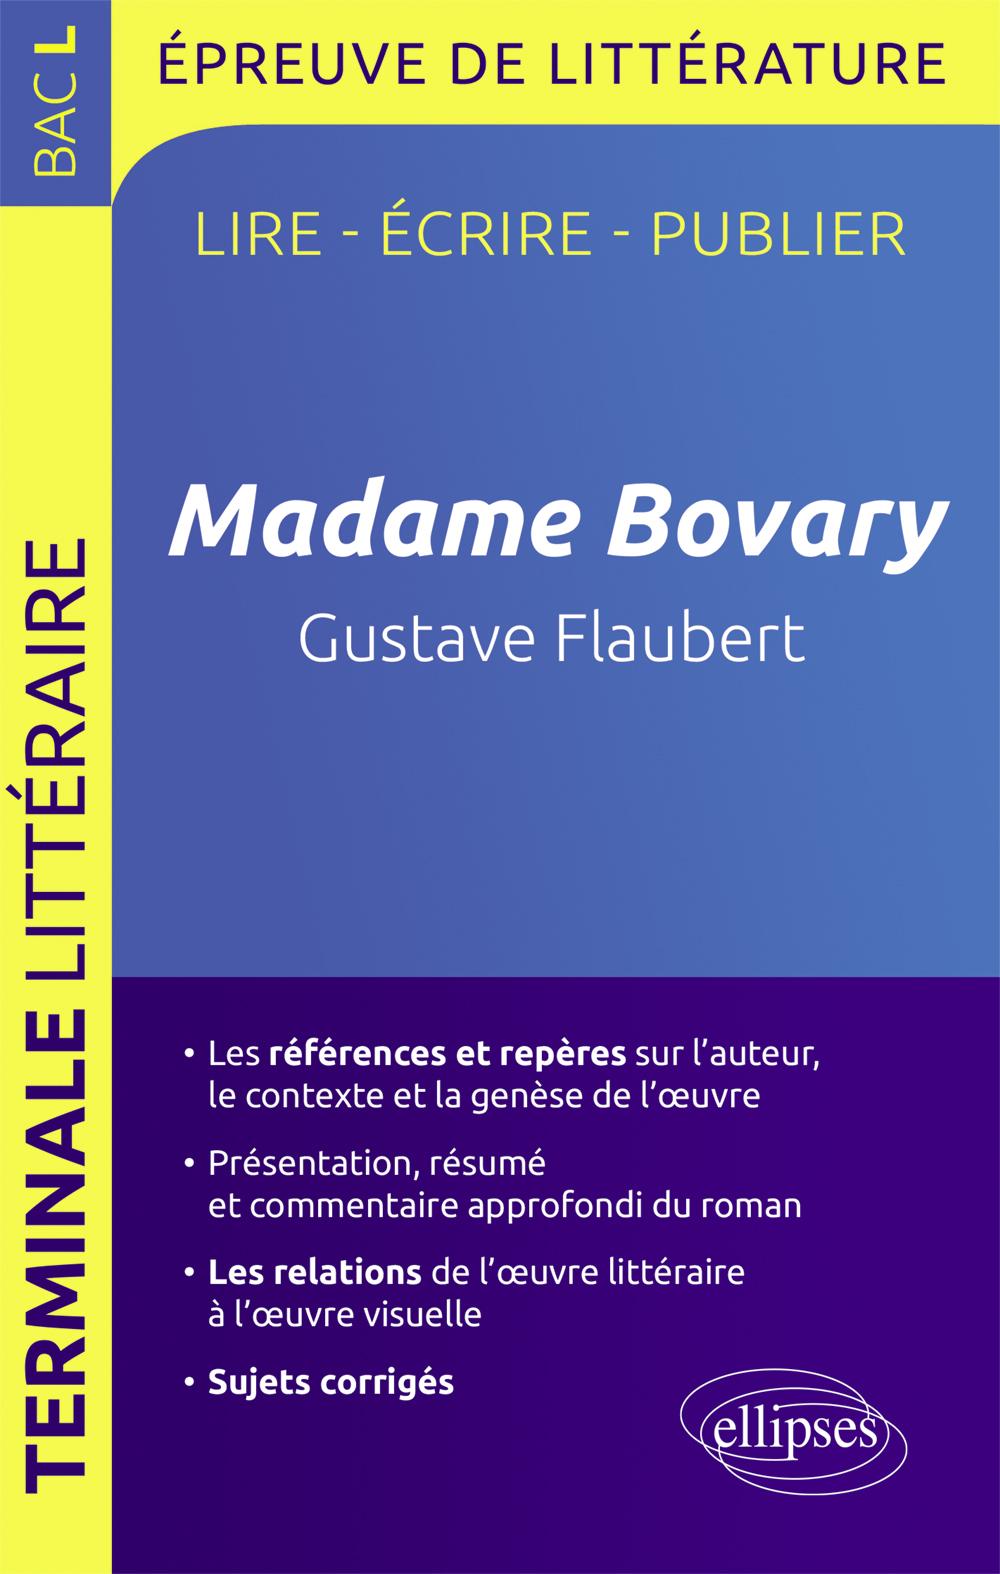 MADAME BOVARY GUSTAVE FLAUBERT TERMINALE L LIRE ECRIRE PUBLIER